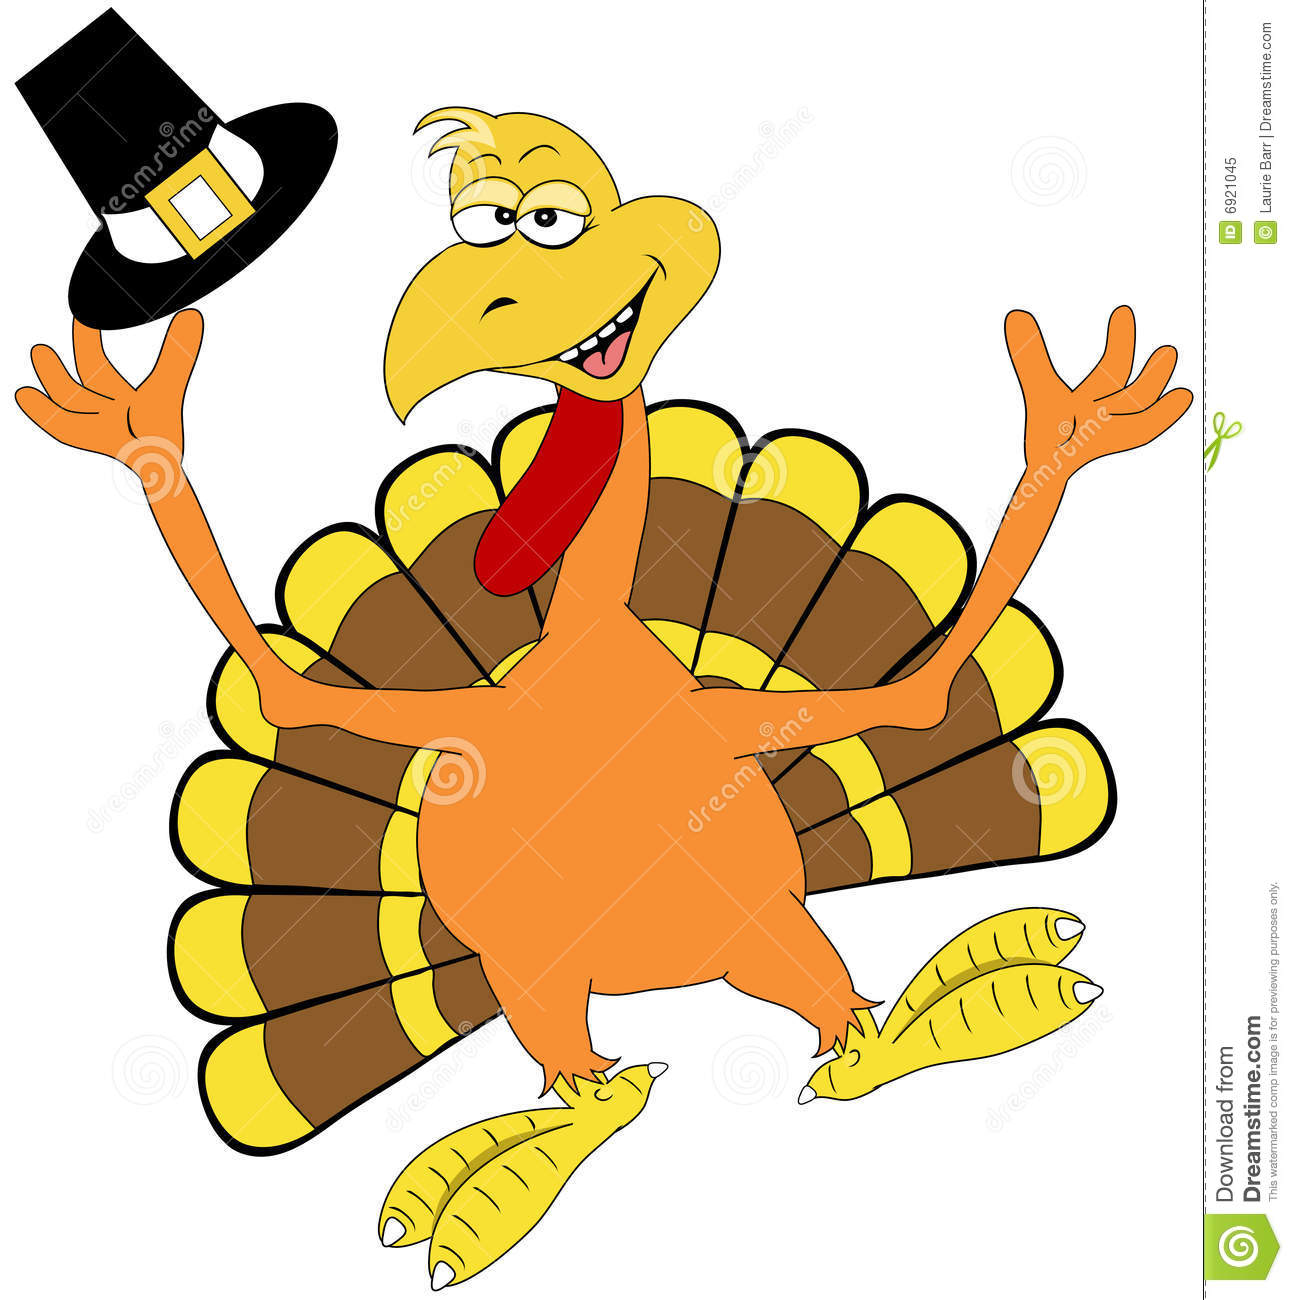 dancing-turkey-clipart-happy-thanksgiving-turkey-6921045.jpg